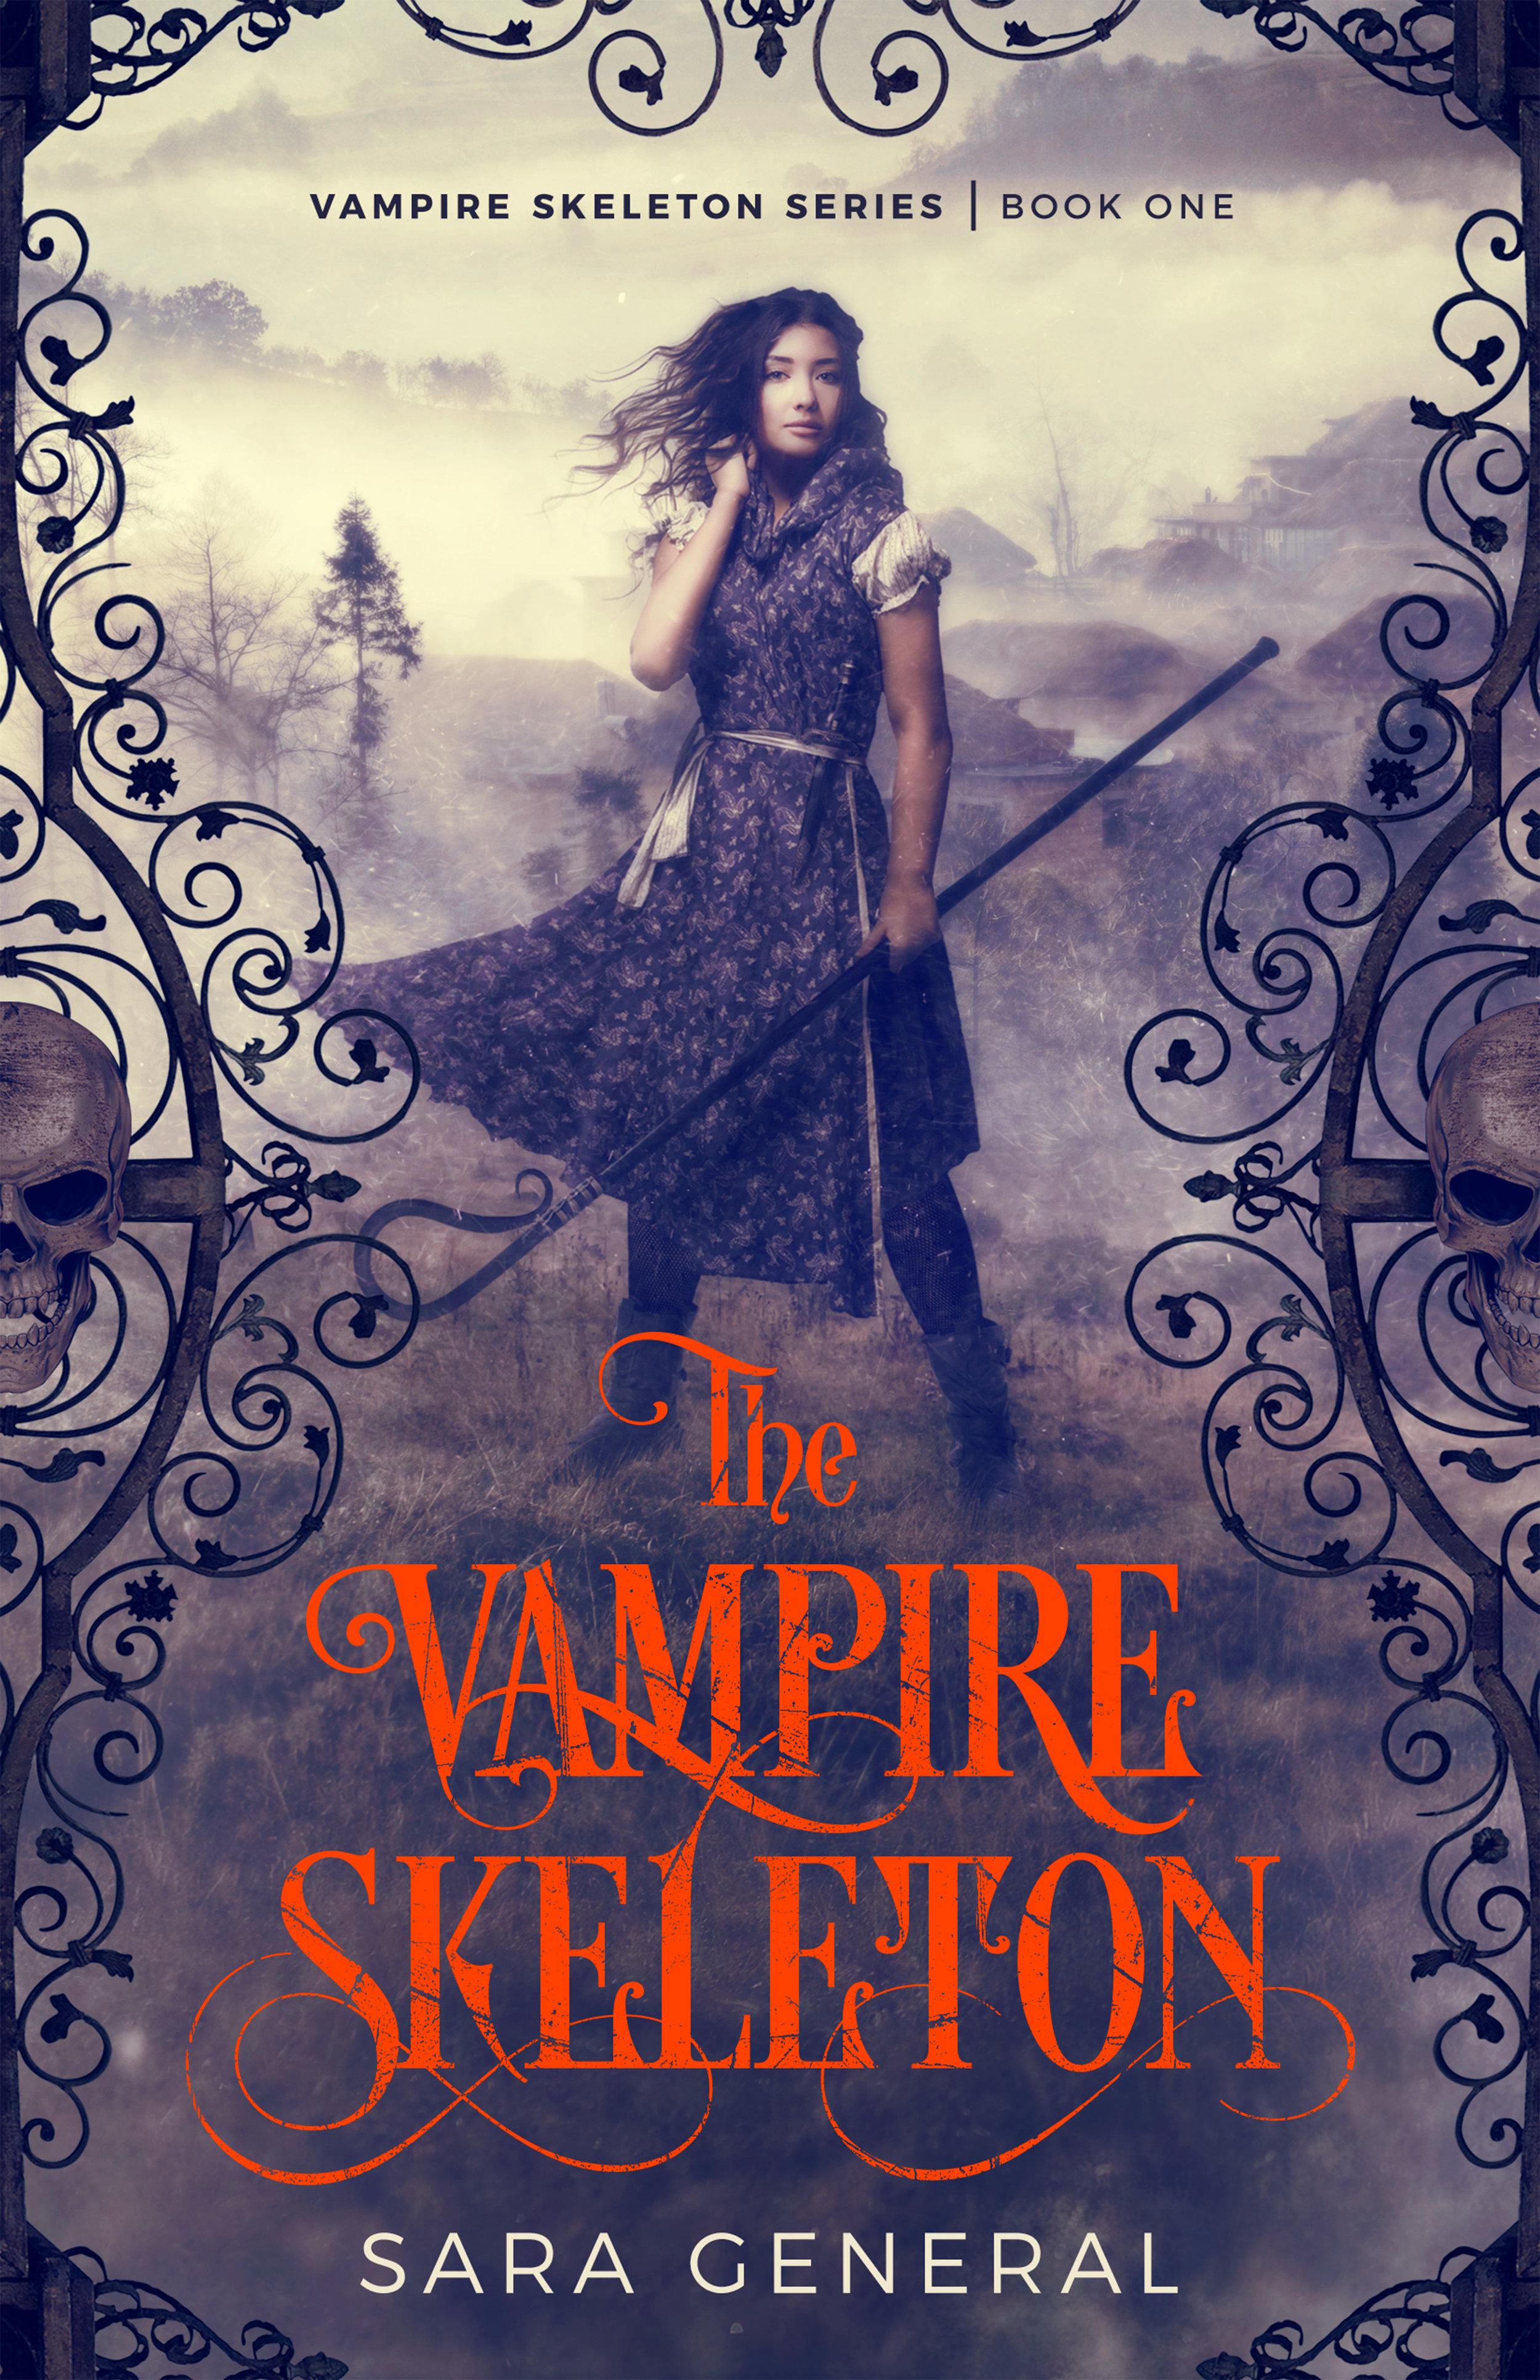 The-Vampire-Skeleton-Amazon-Ebook.jpg